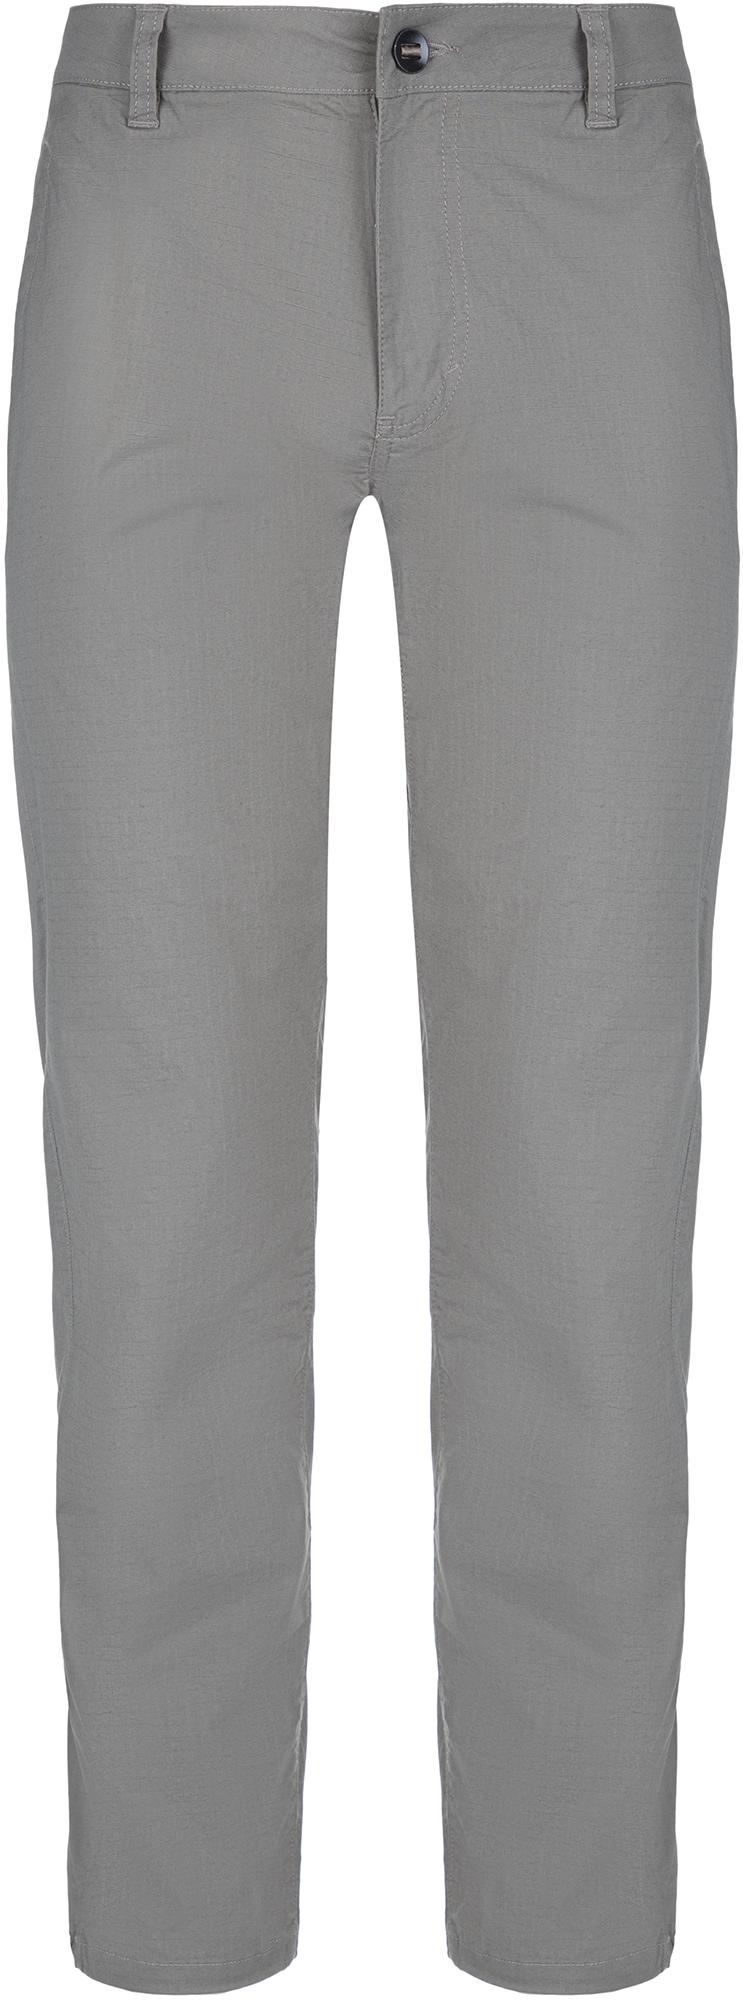 Mountain Hardwear Брюки мужские Mountain Hardwear J Tree™, размер 50